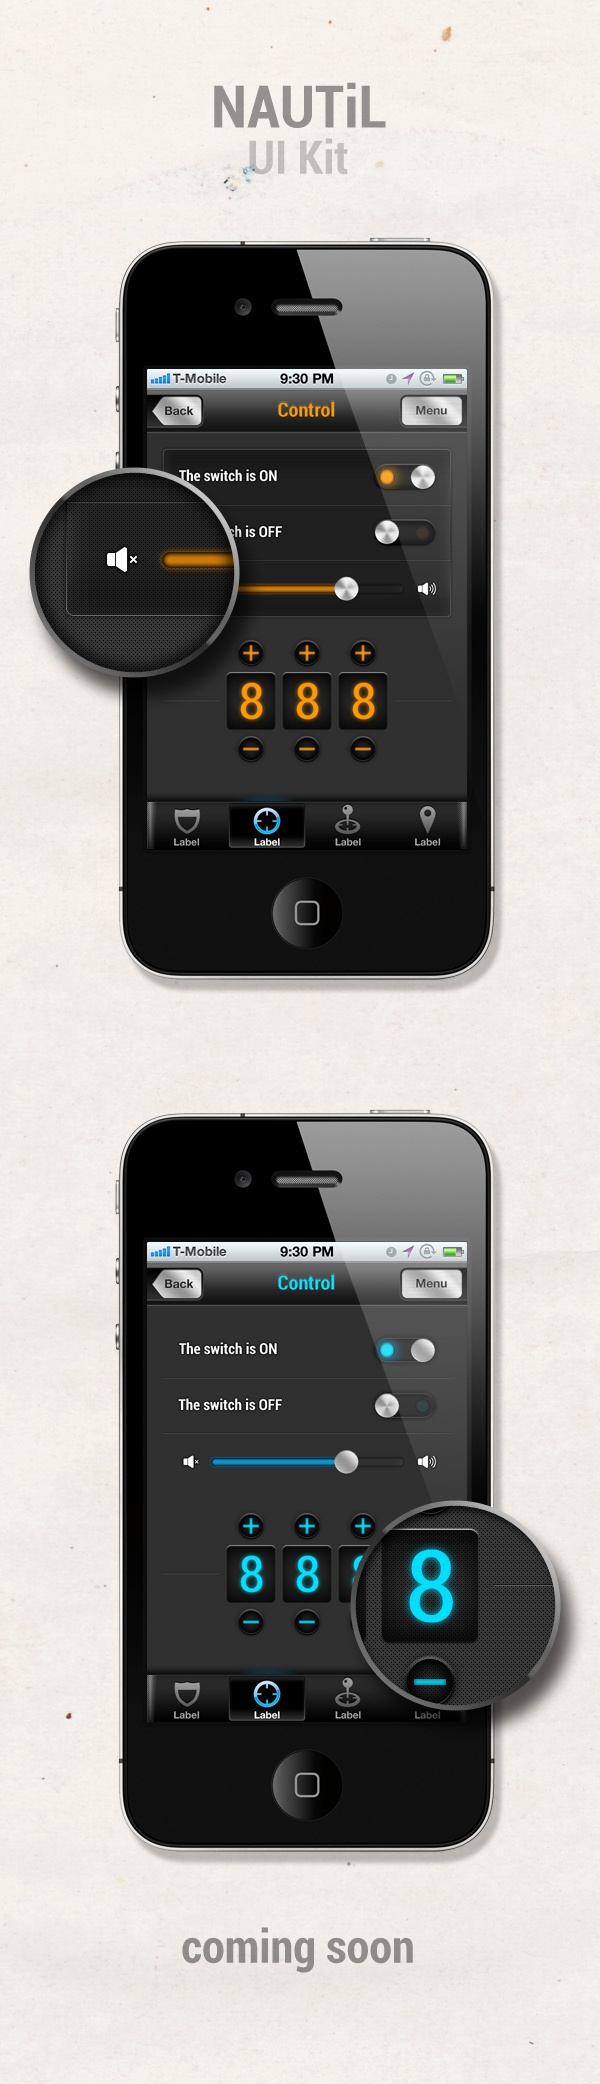 NAUTiL UI kit by Gabor Sandor Styt, via Behance